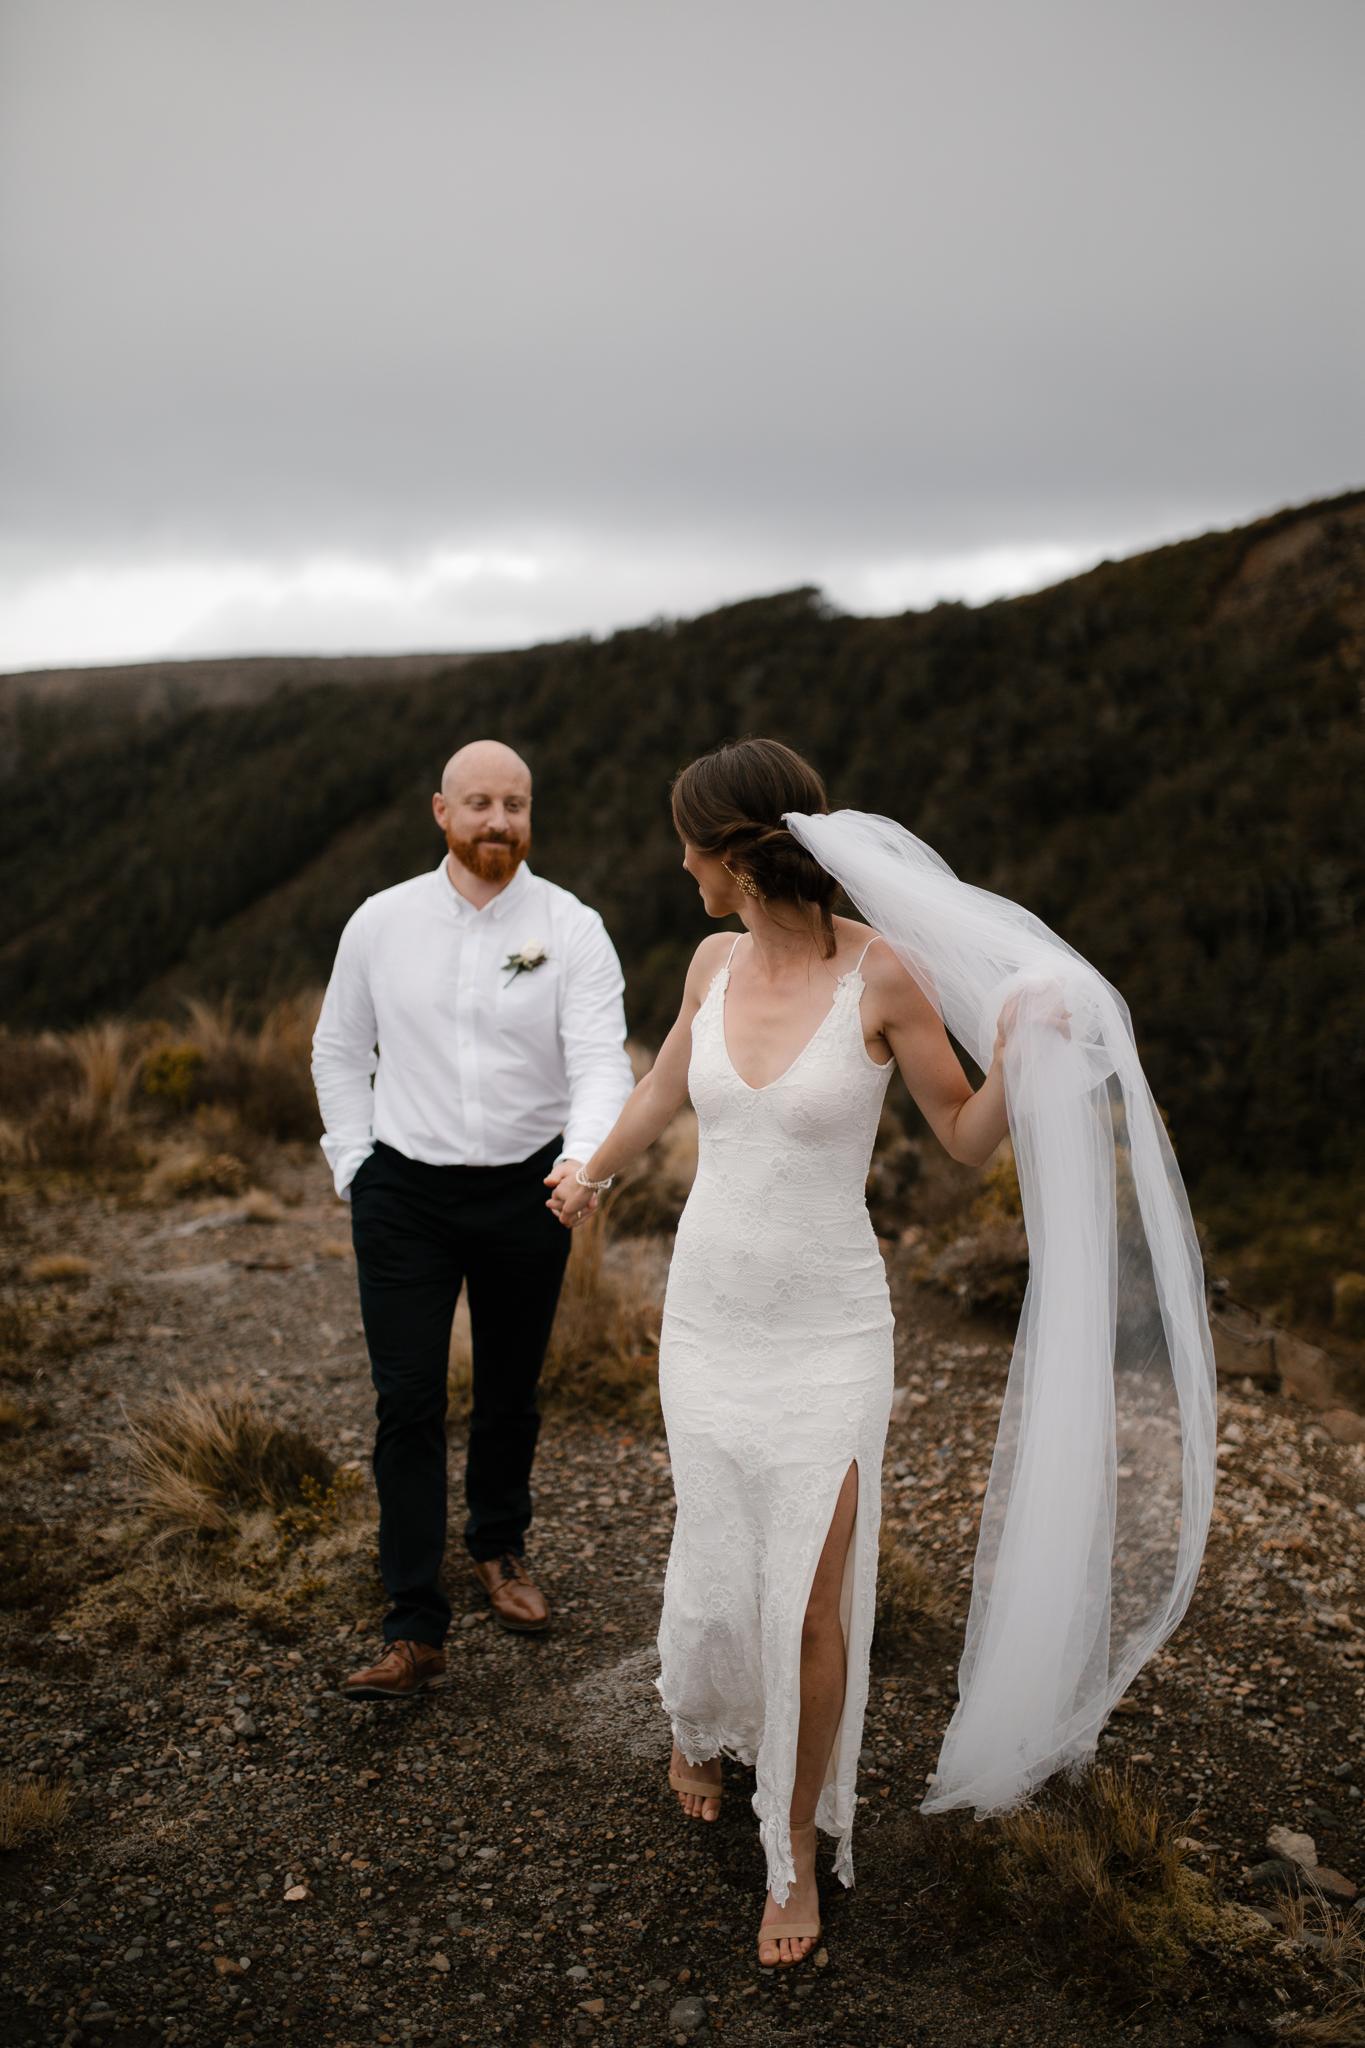 Jesse and Jessie Weddings Queenstown New Zealand wedding photographer